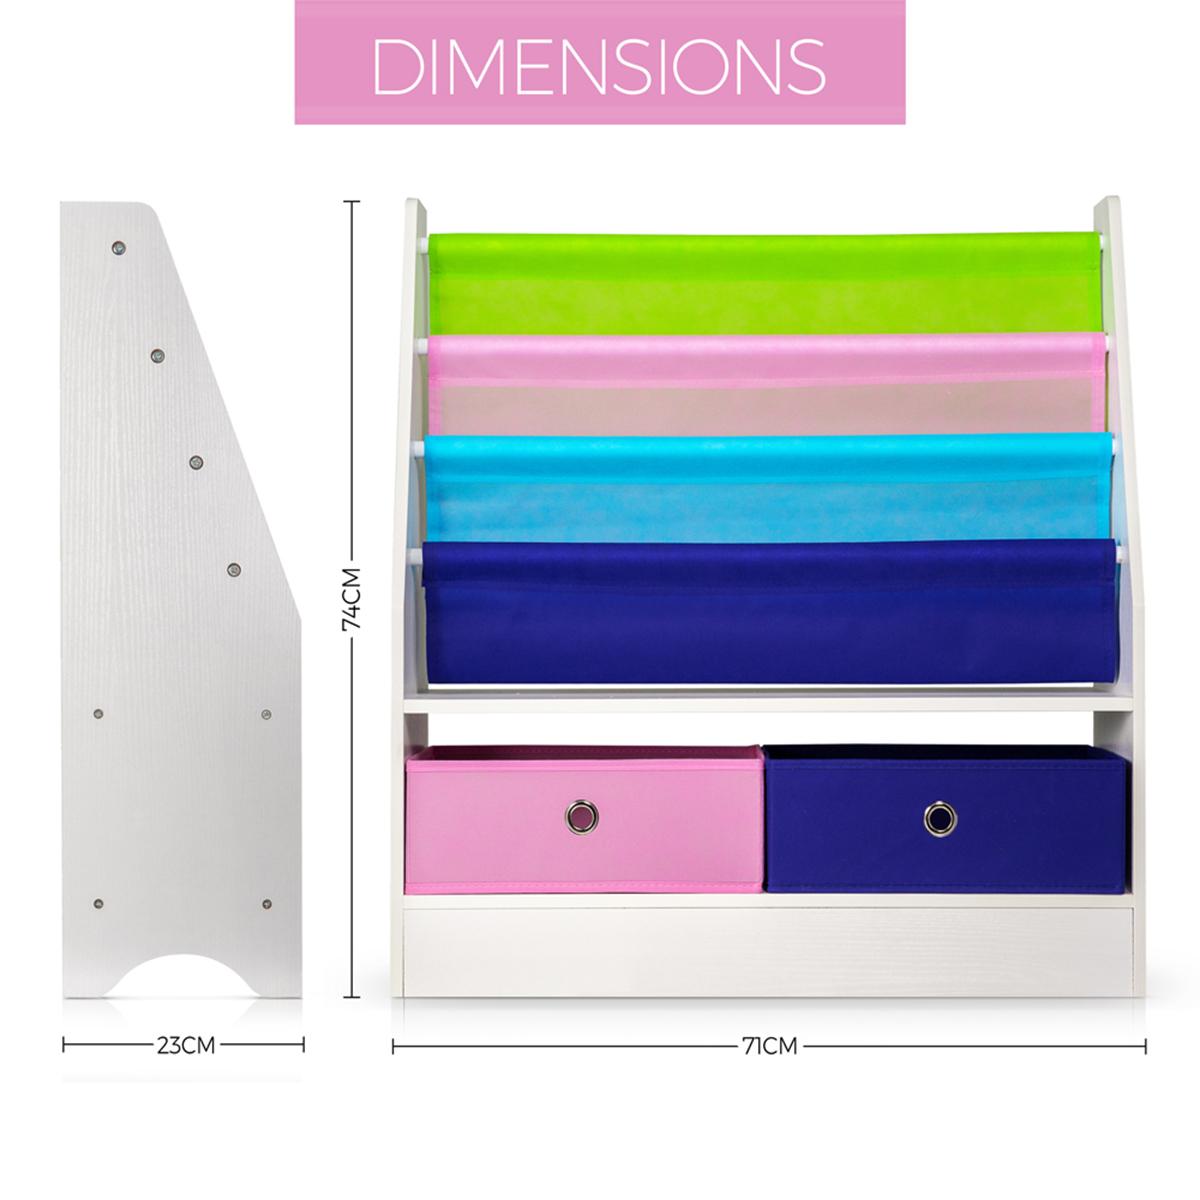 Wood Effect Kids Playroom Bedroom Storage Chest Trunk: 4 SLINGS 2 BOX CHILDREN BOOKS & TOYS STORAGE RACK WOODEN